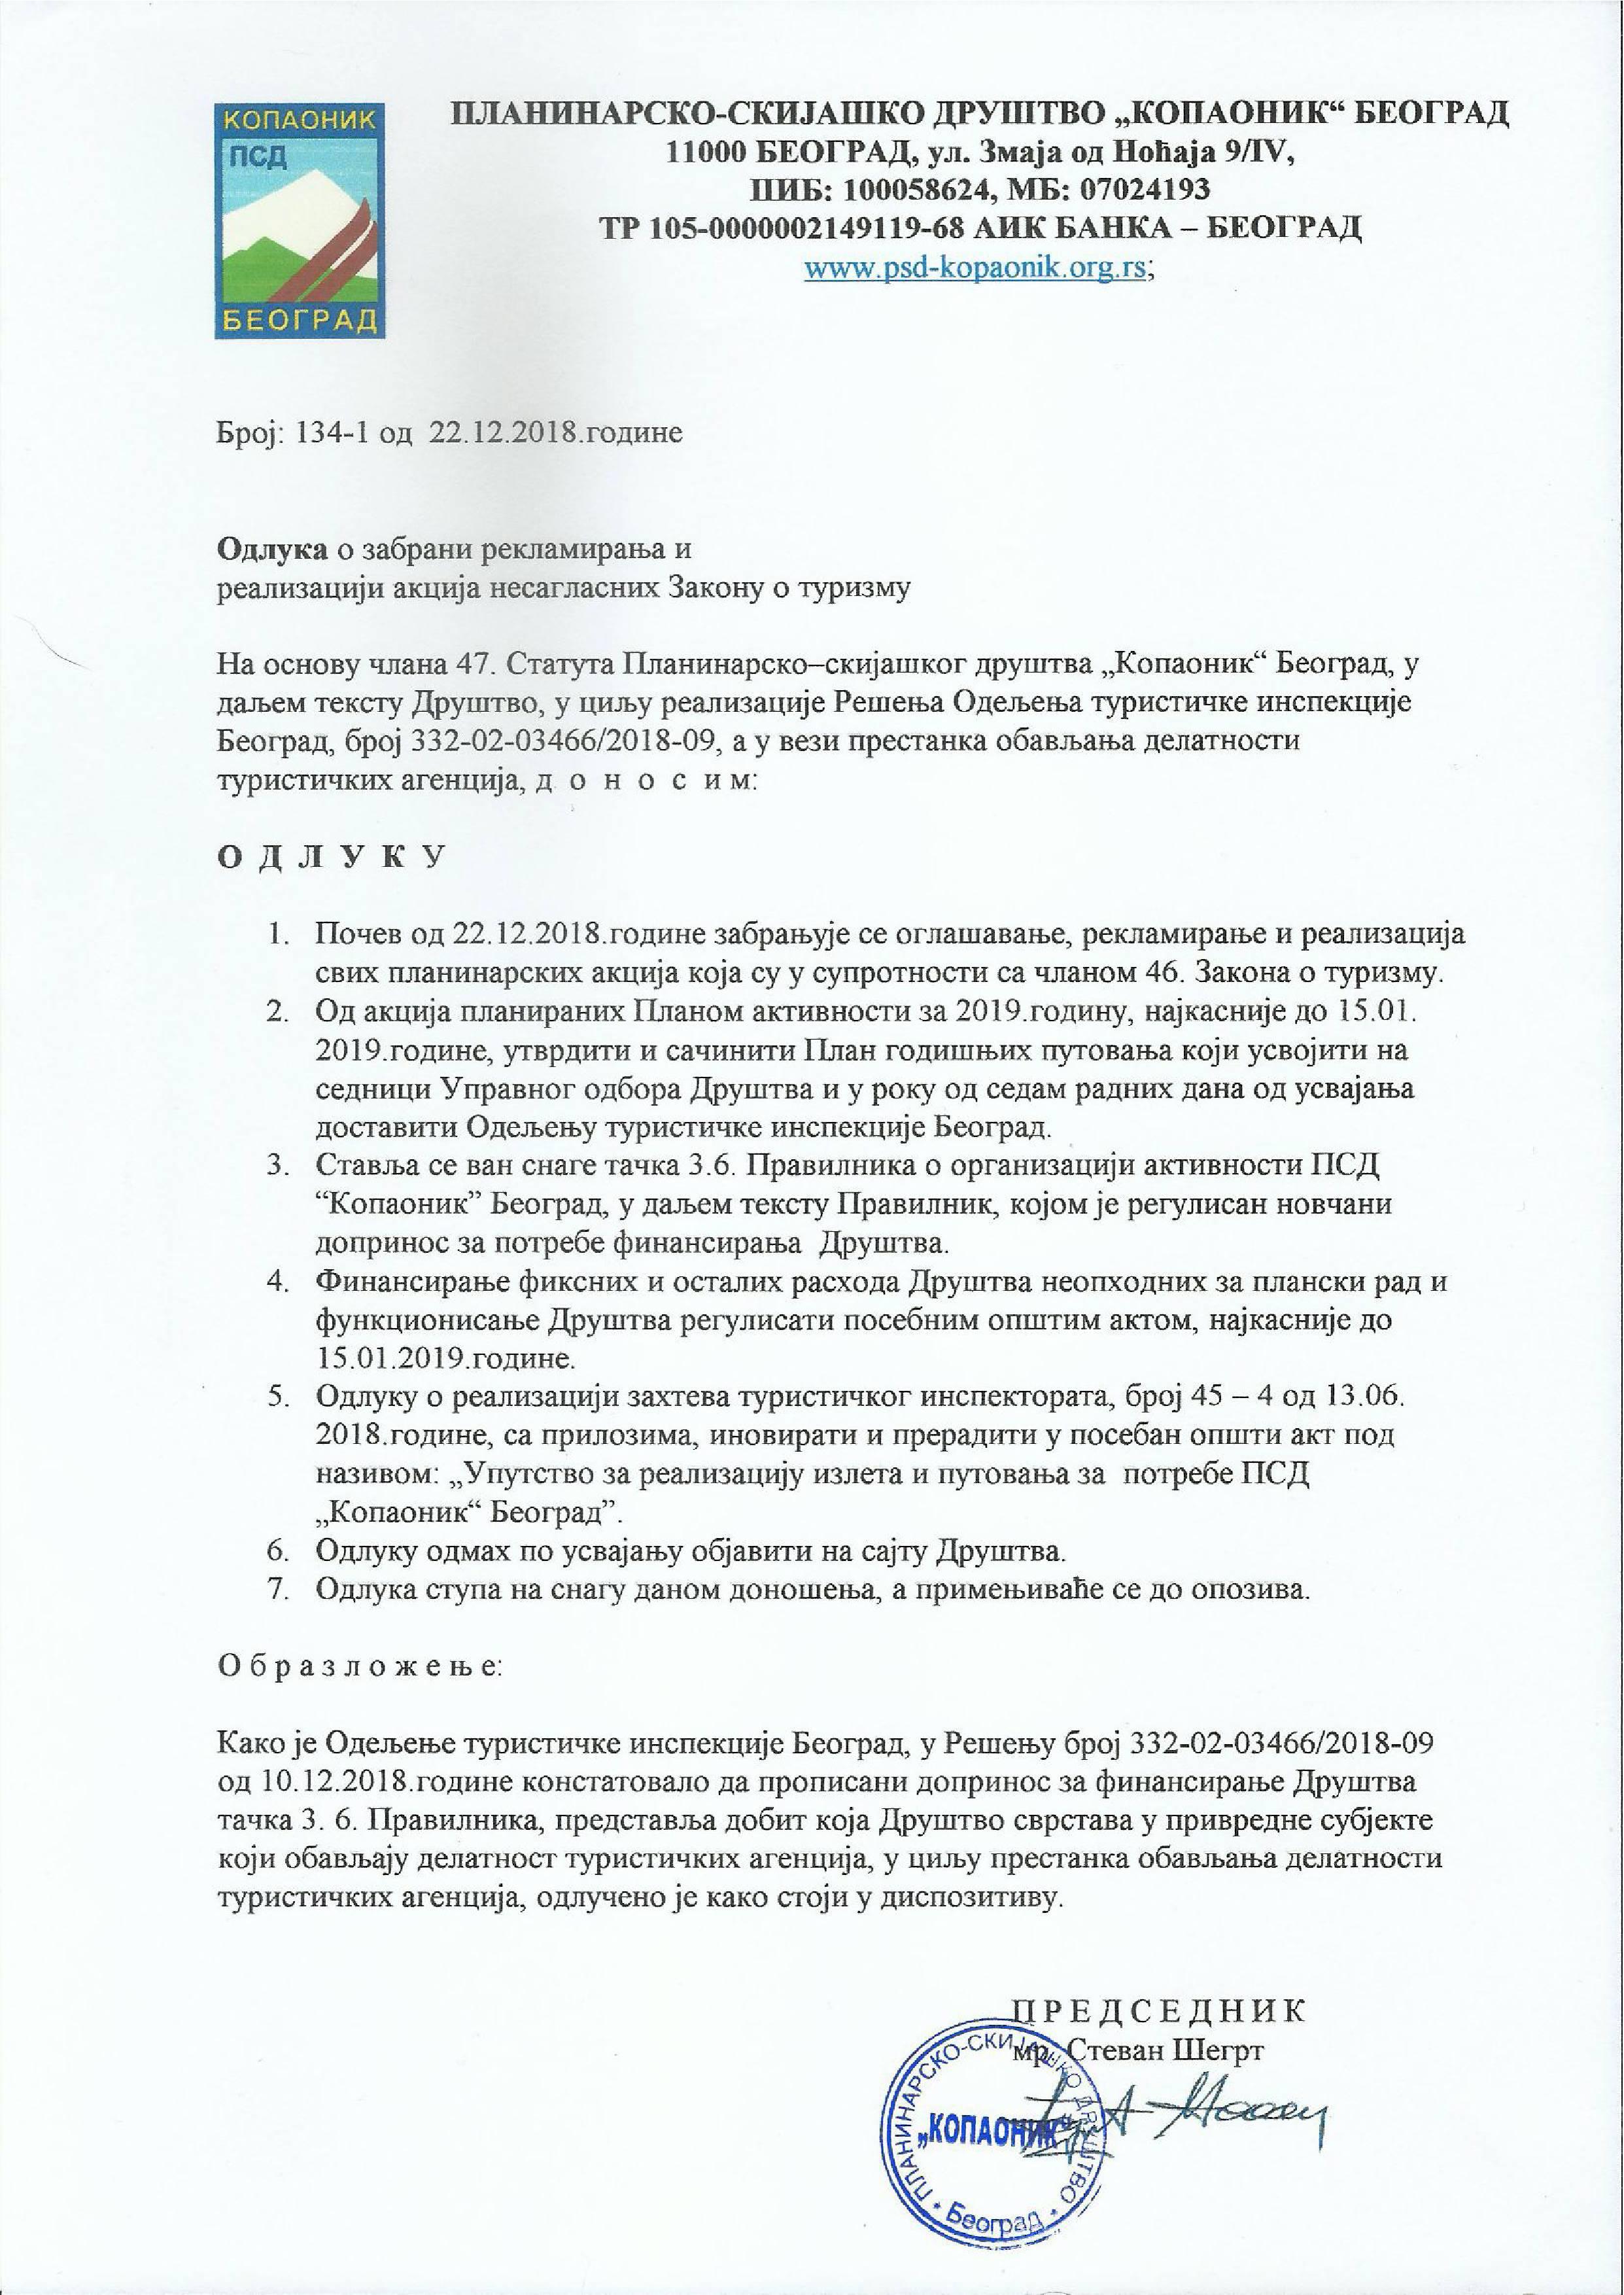 ODLUKA_o_zabrani_reklamiranja_i_realizaviji_akcija_nesaglasnih_.jpg - 790,89 kB